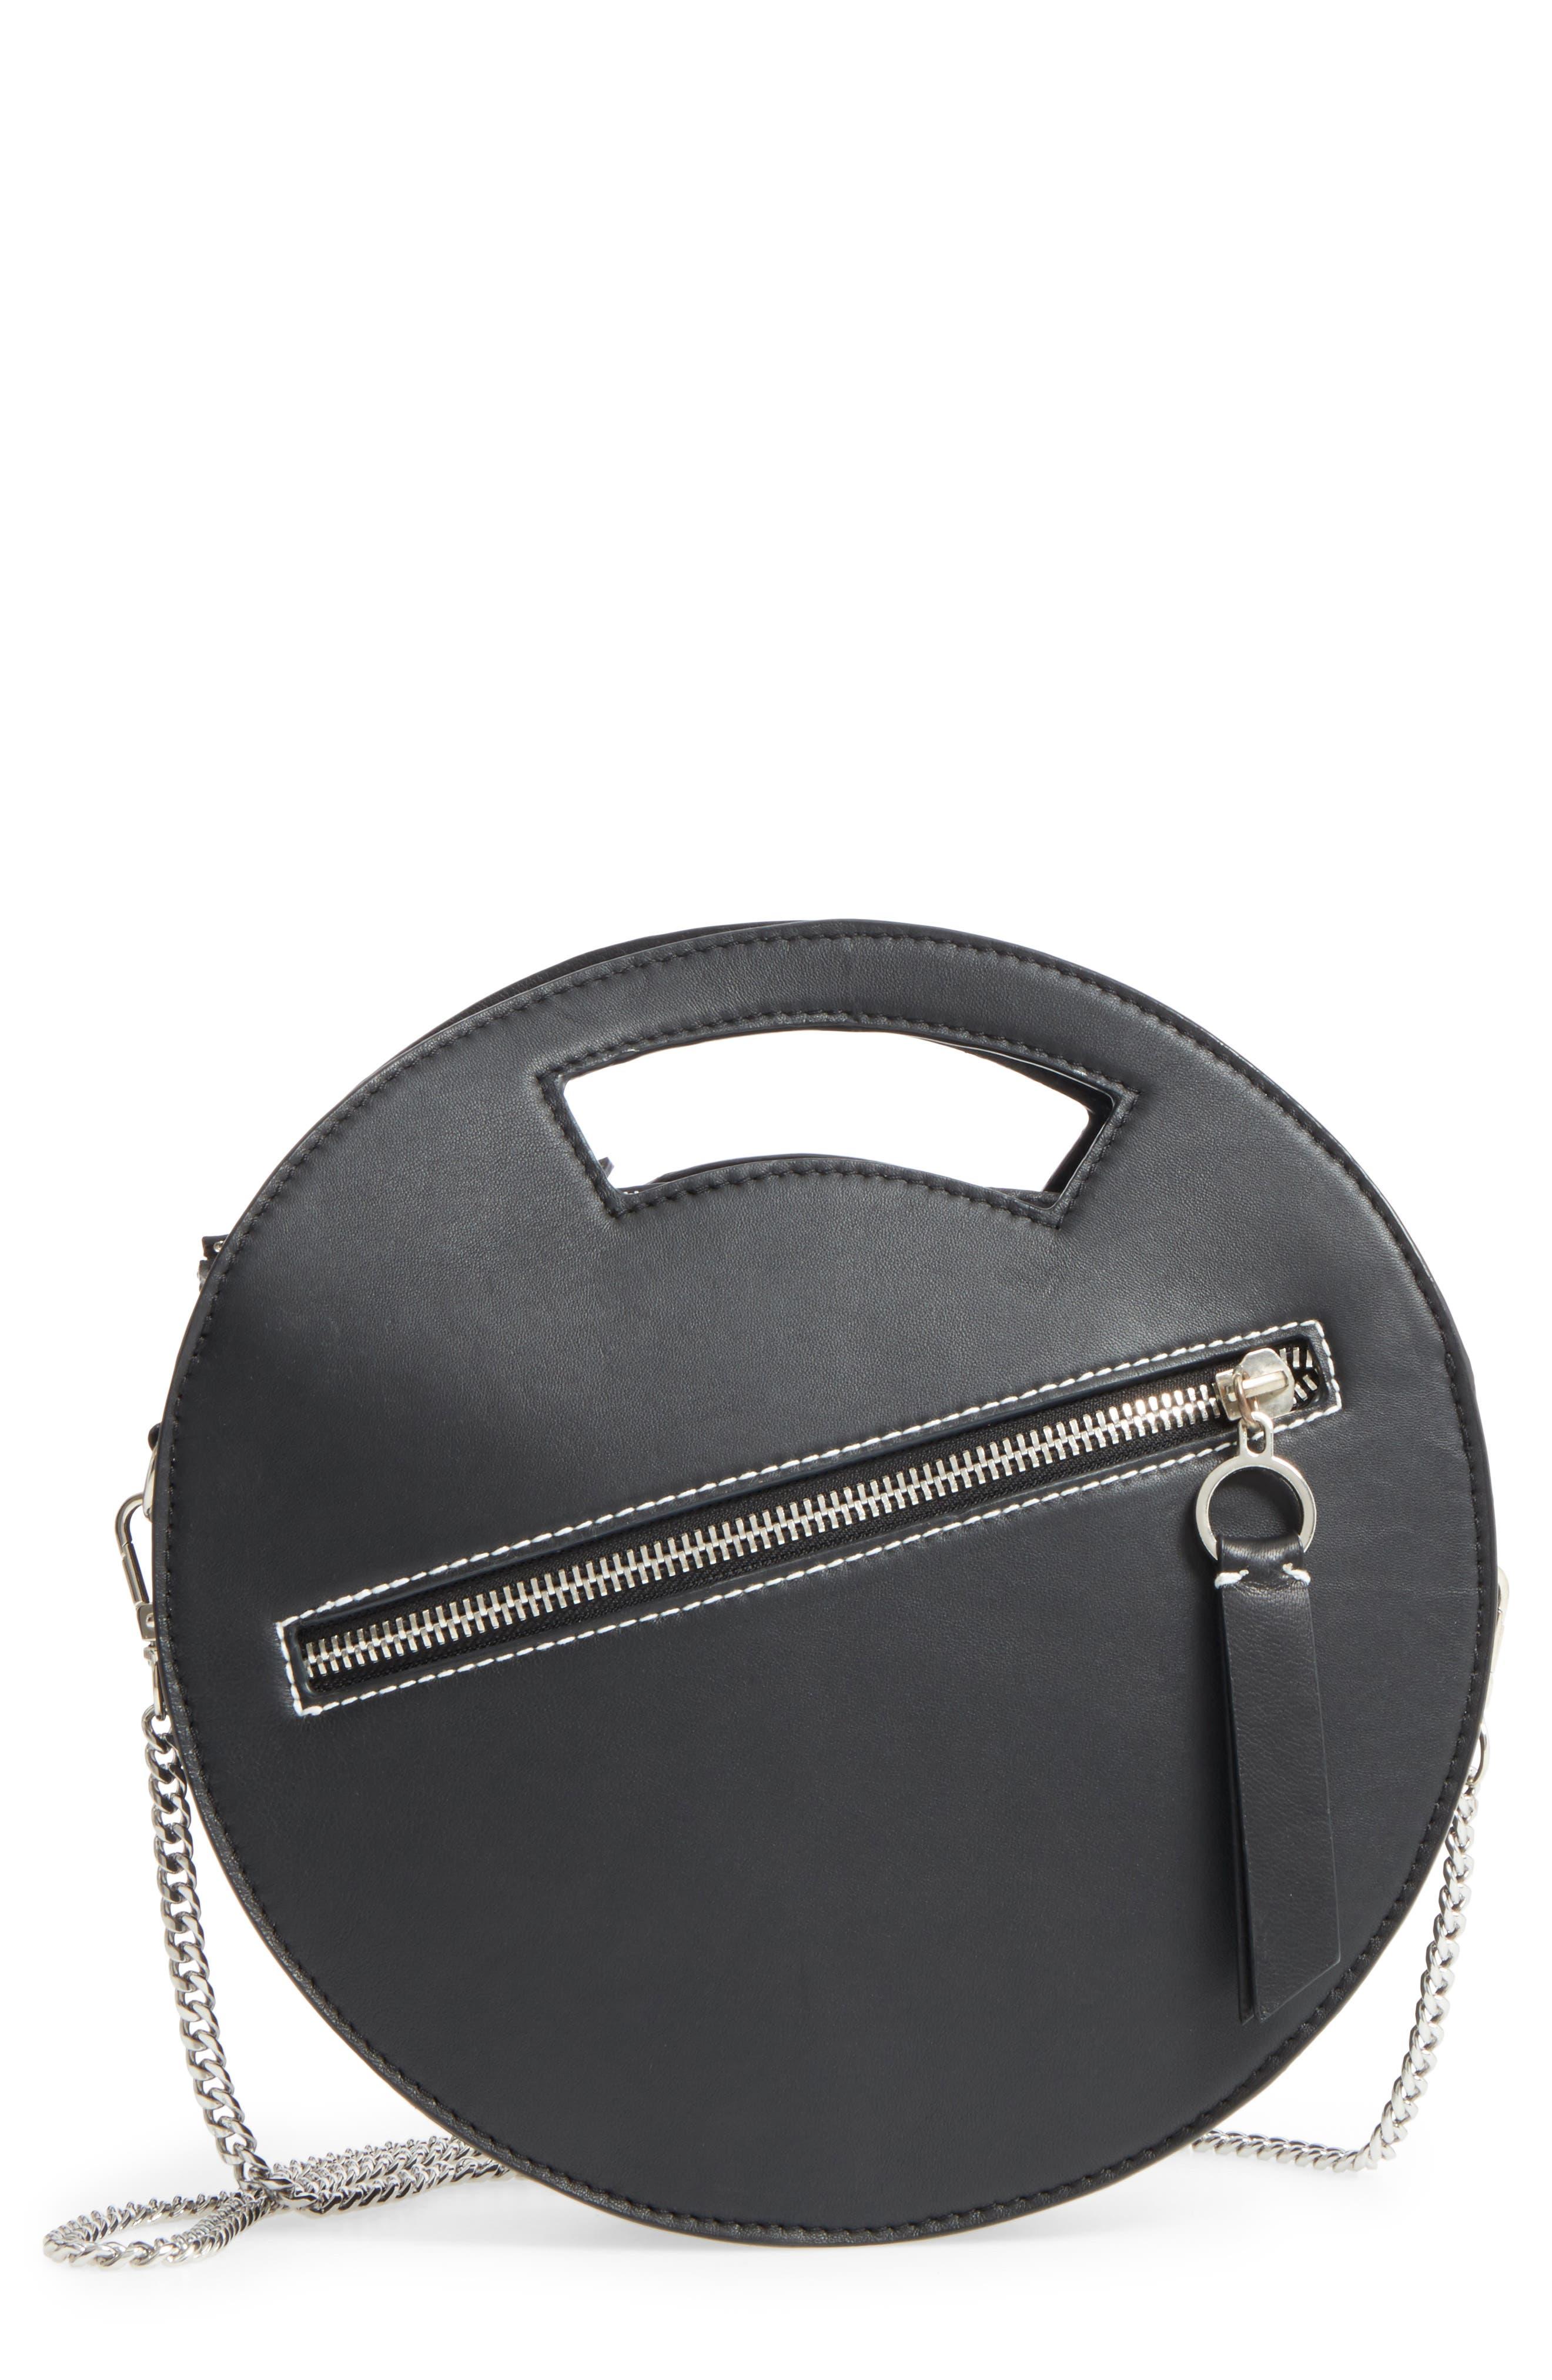 Premium Leather Circle Crossbody Bag,                         Main,                         color, Black